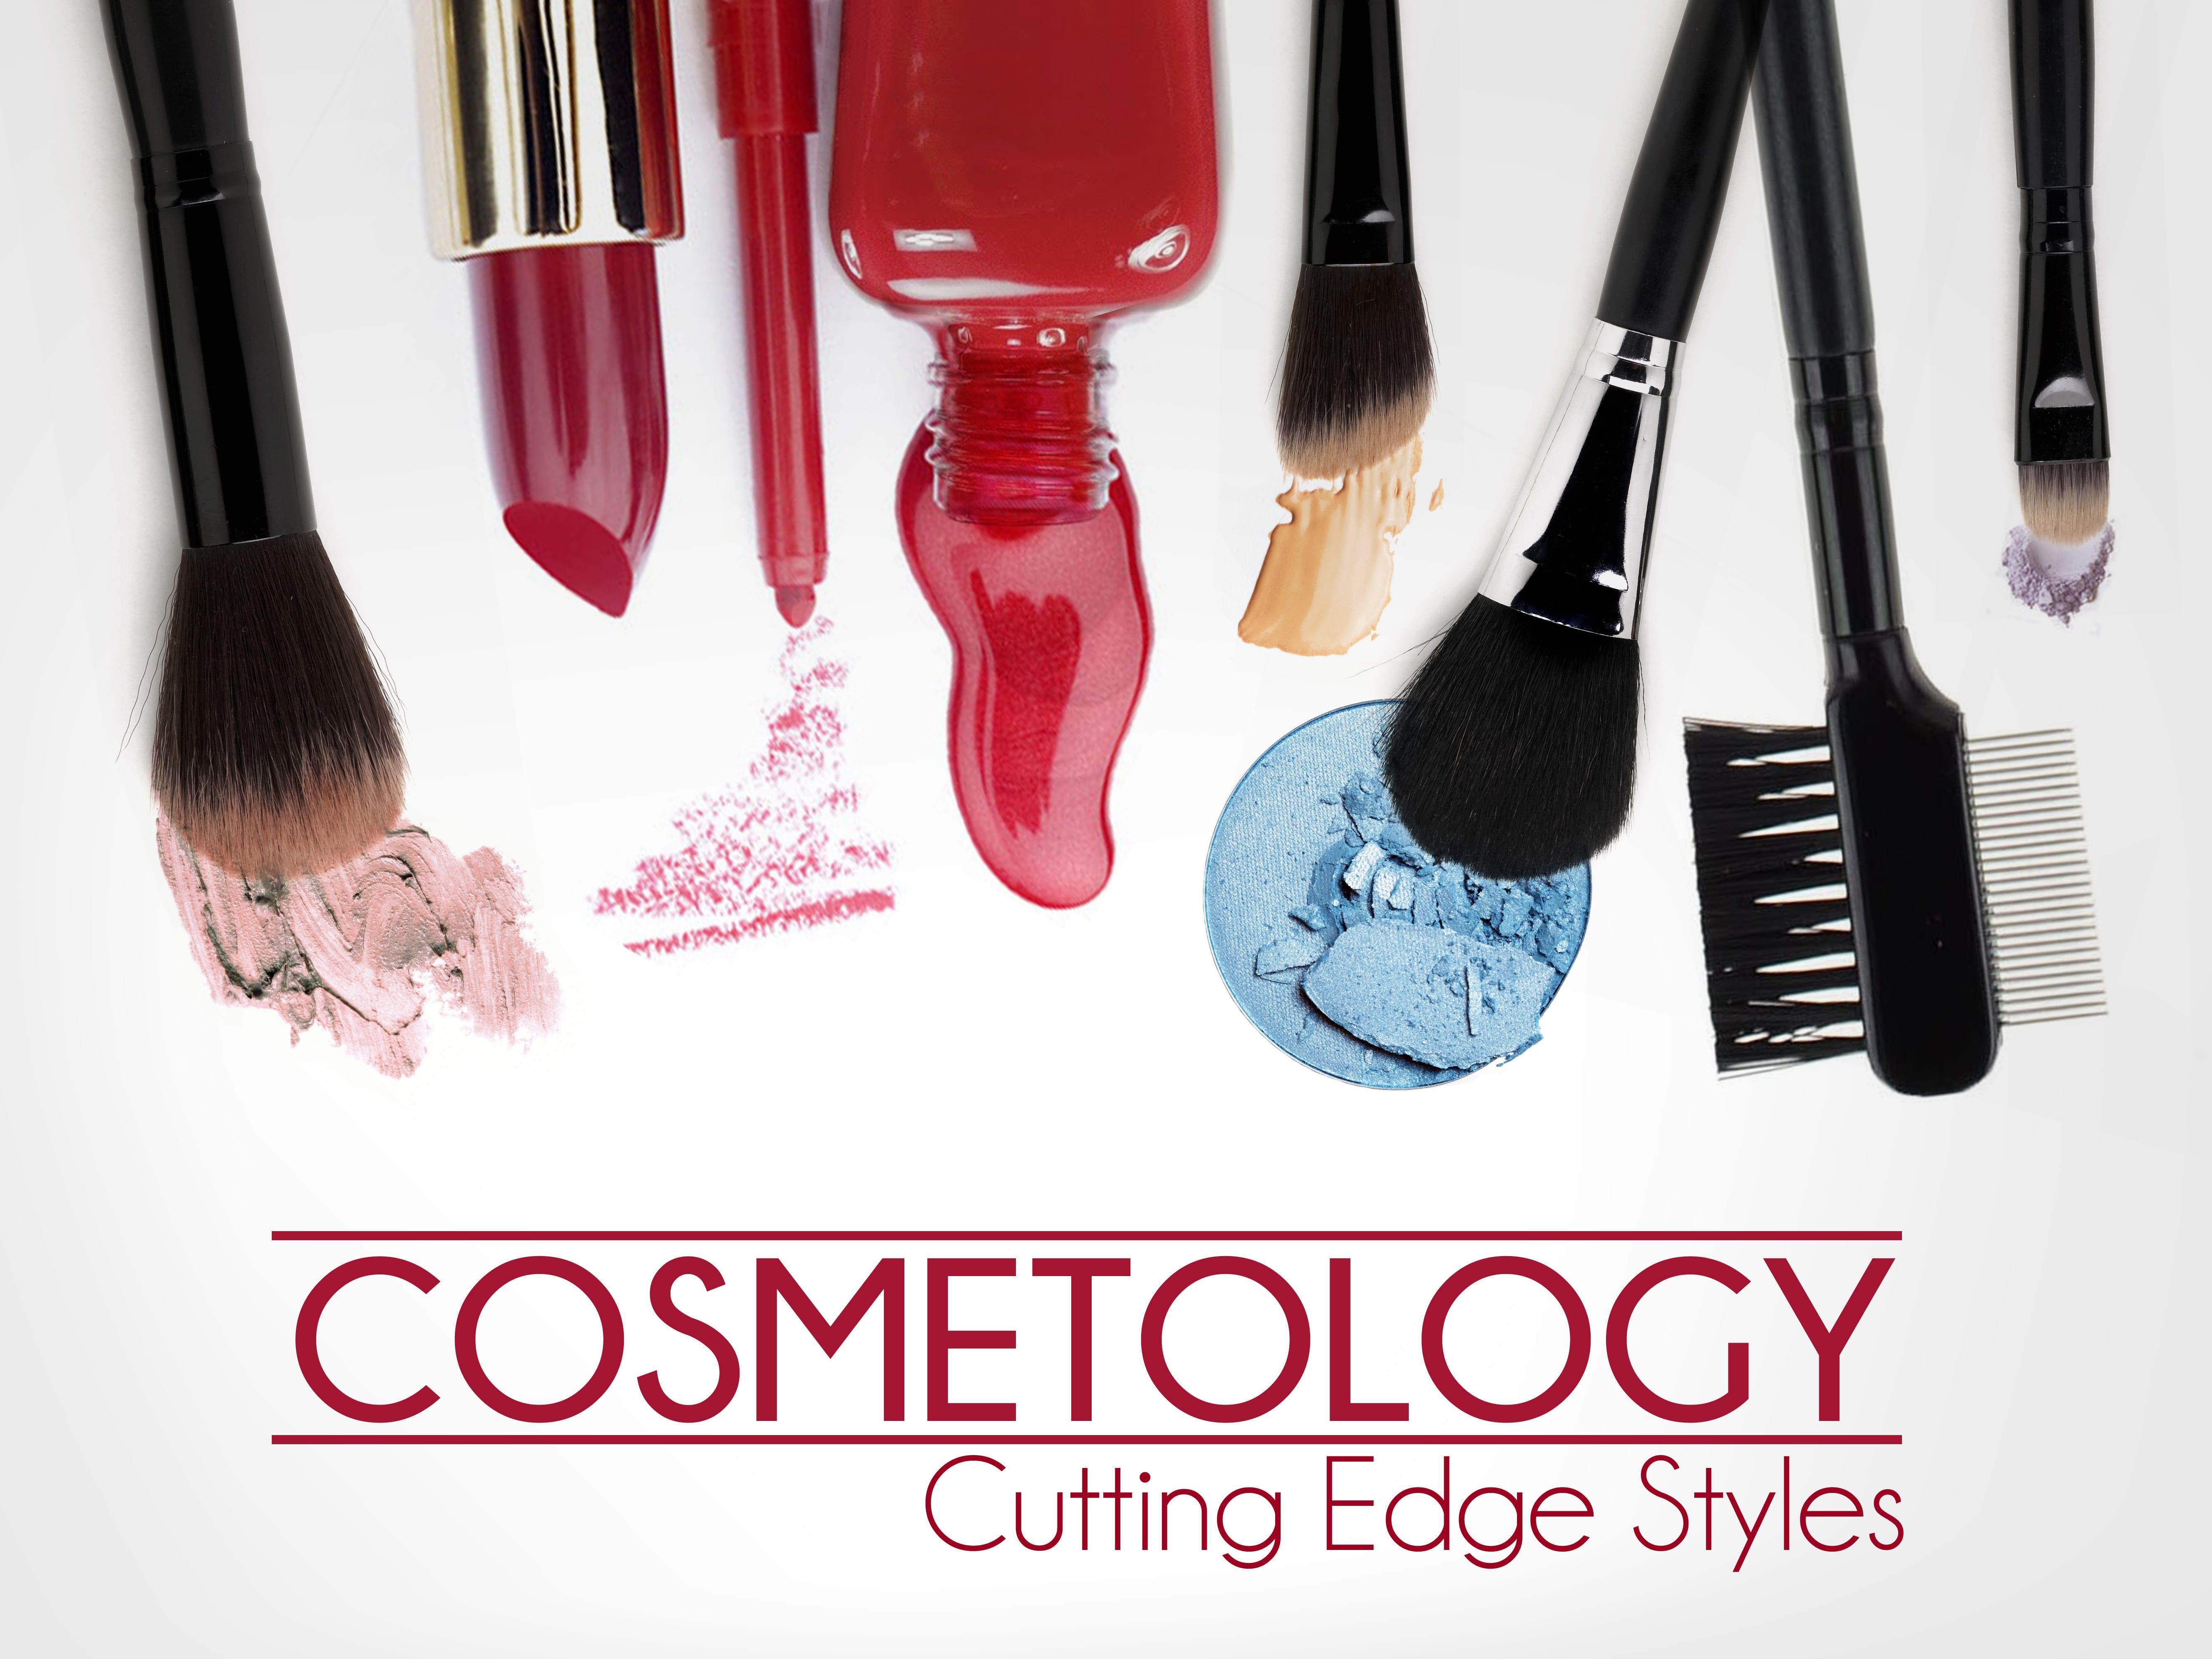 Cosmetology Cutting Edge Styles